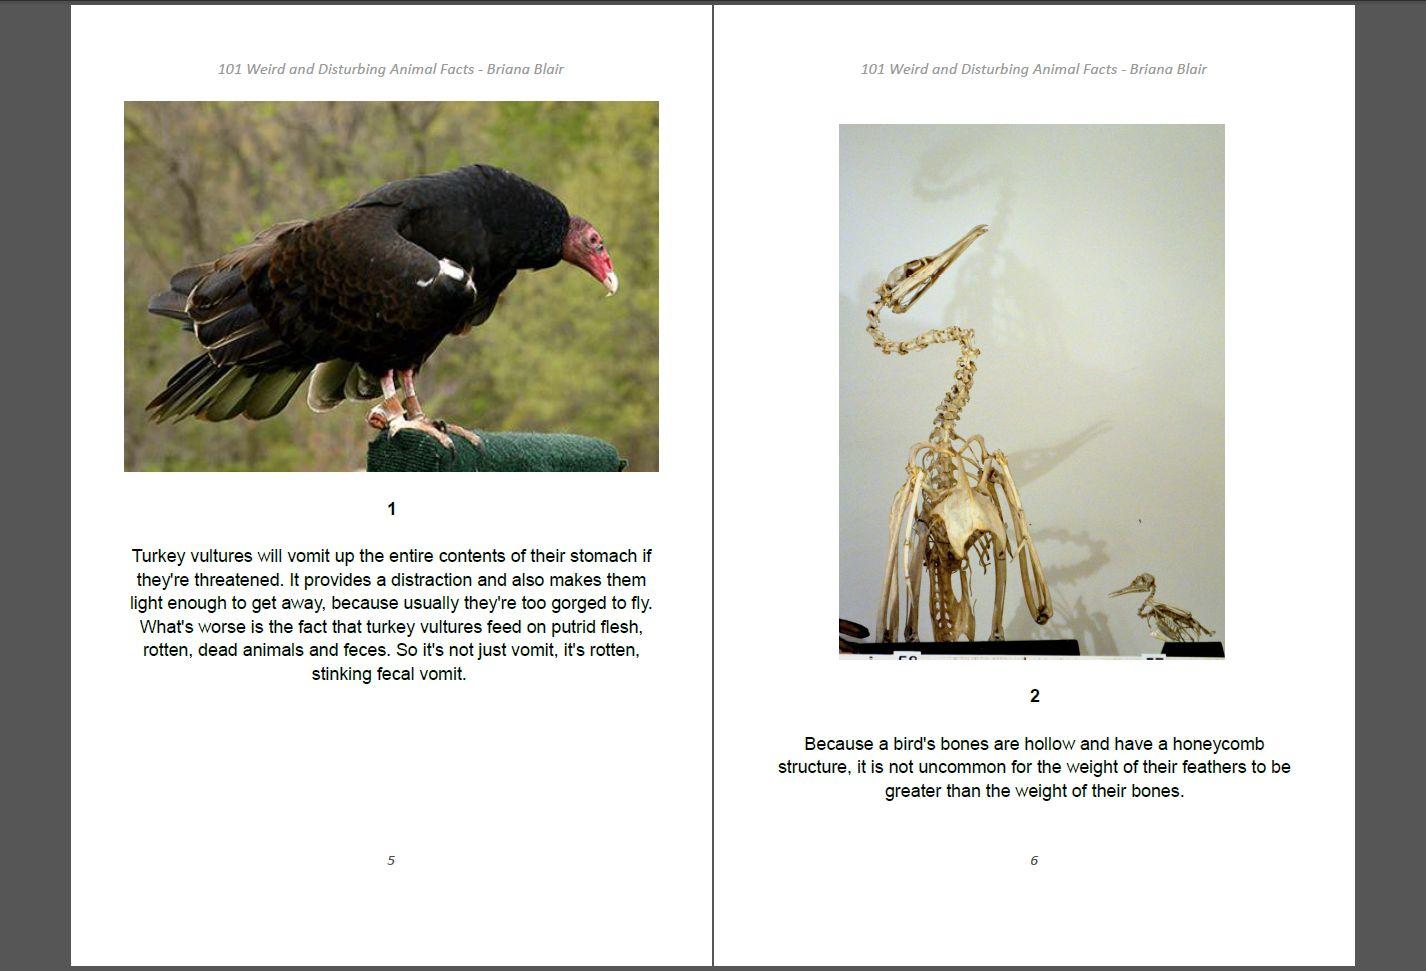 101 Weird and Disturbing Animal Facts by Briana Blair - Nature Ebook 2